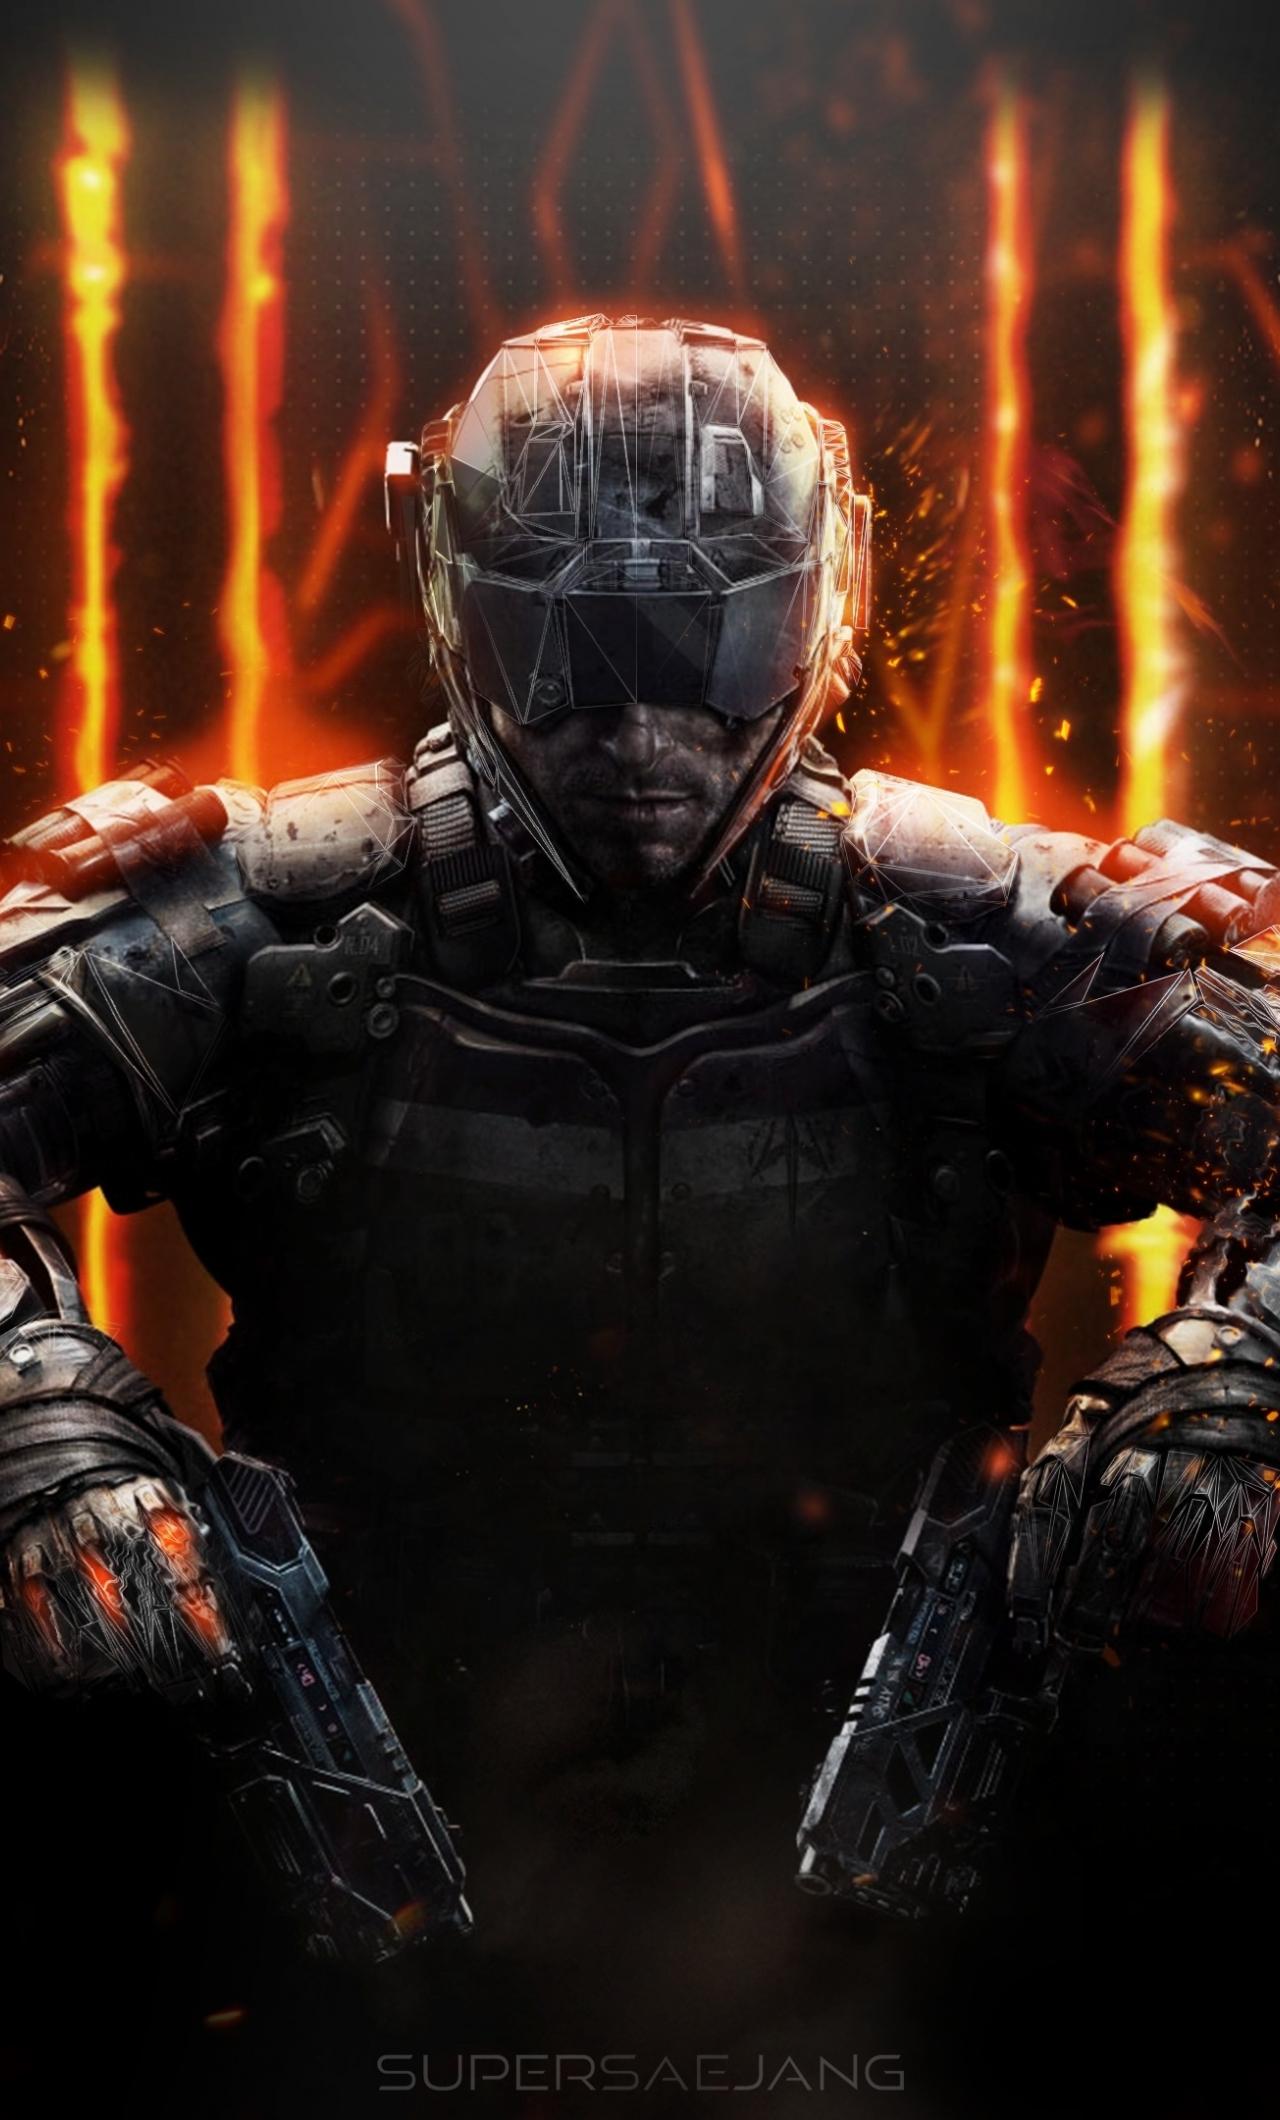 Download 1280x2120 Wallpaper Call Of Duty Black Ops Iii Soldier